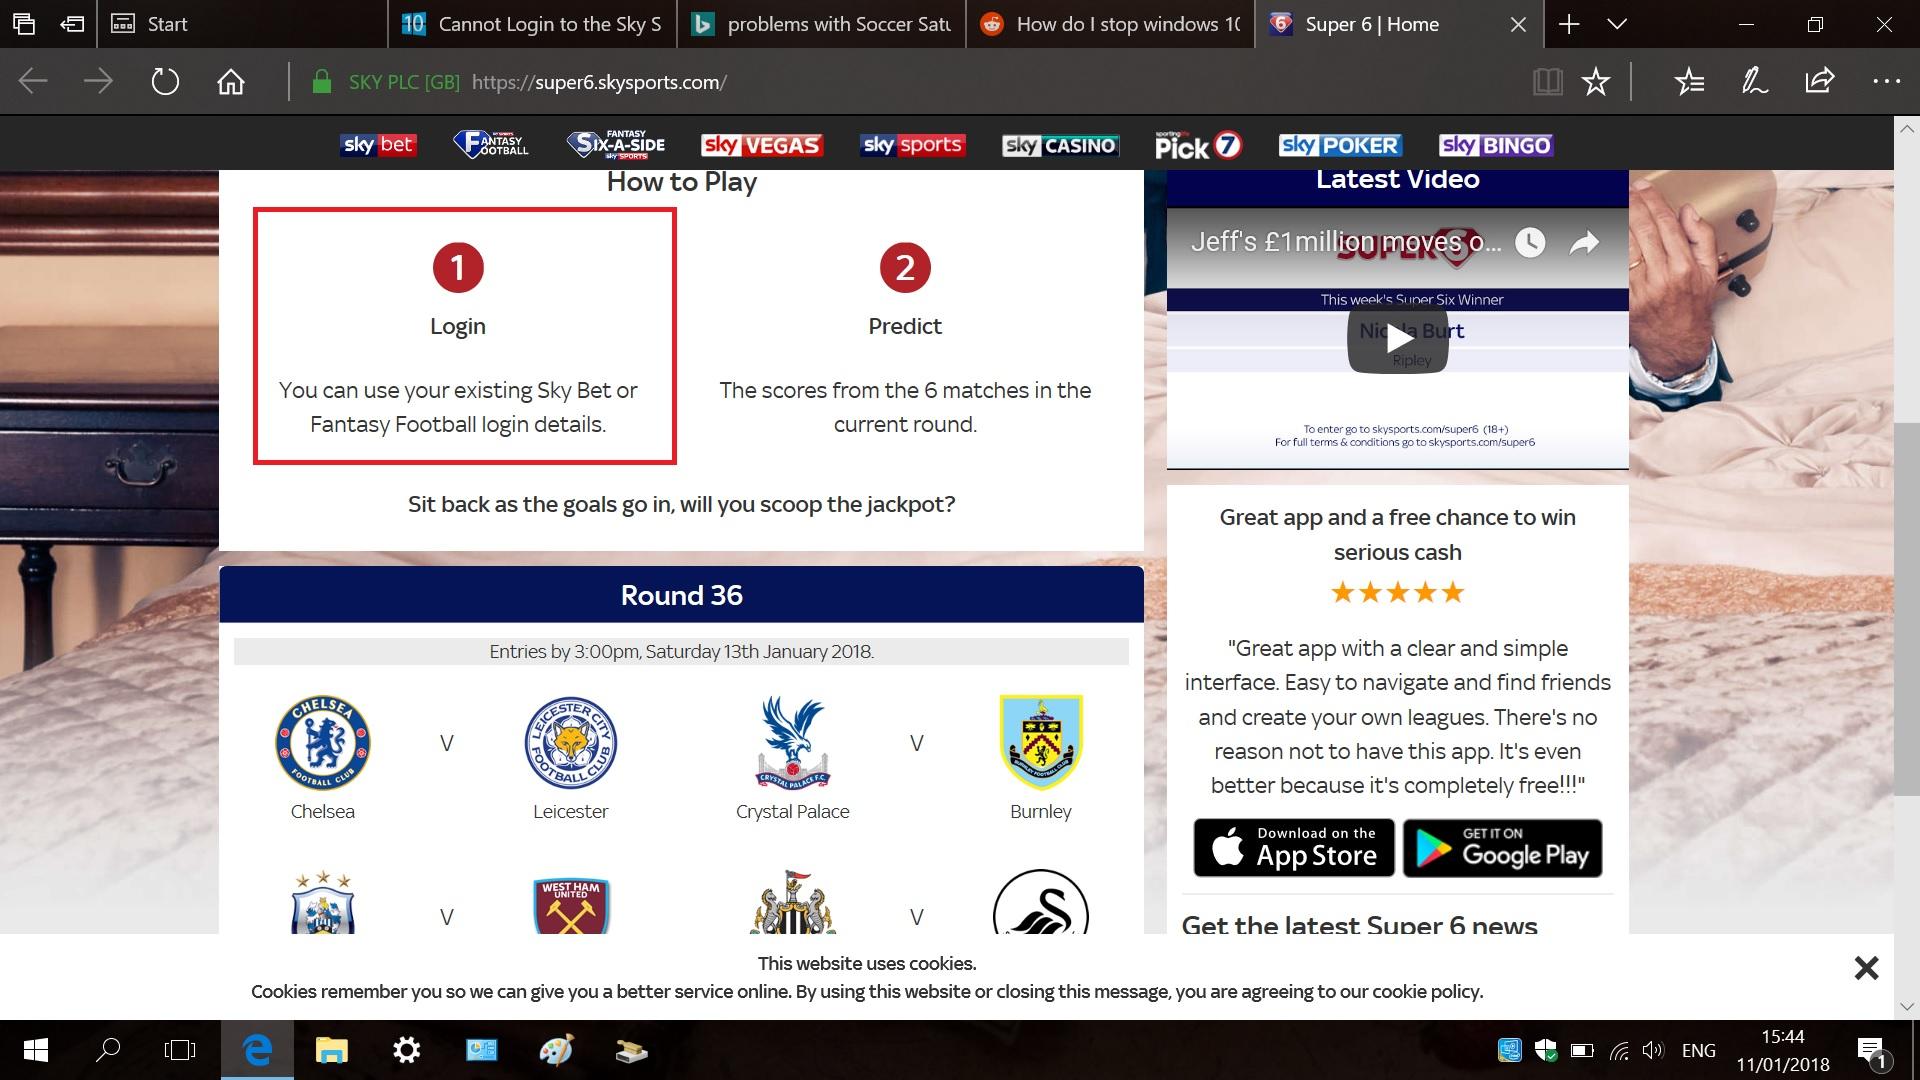 super 6 website.jpg